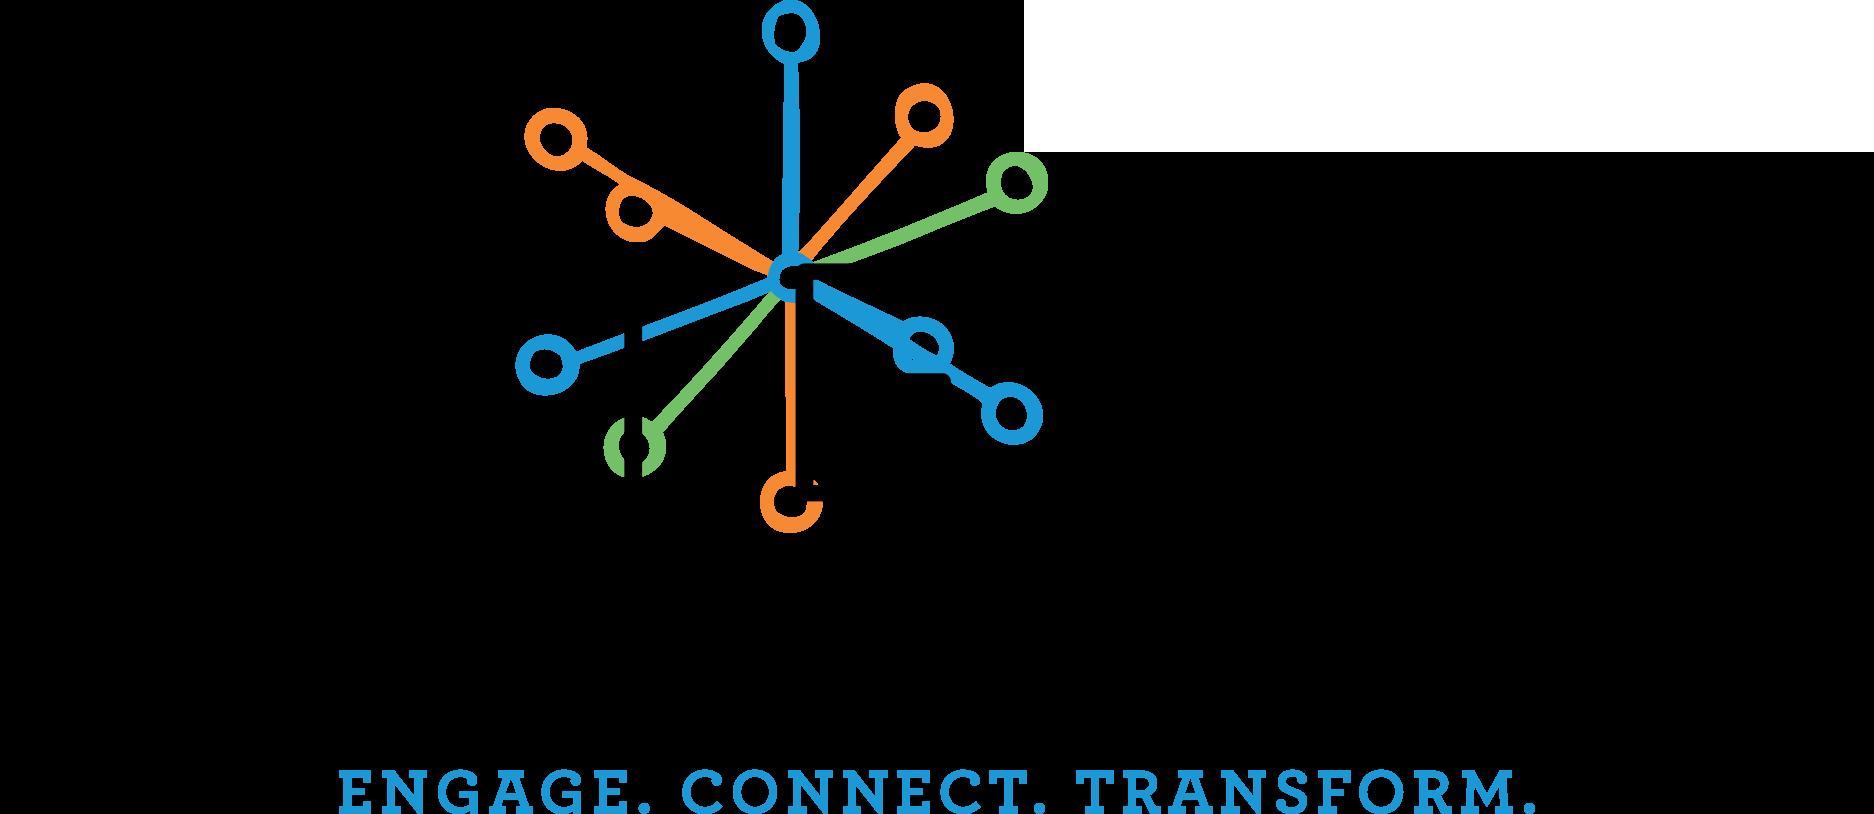 steam lab logo - Google Search